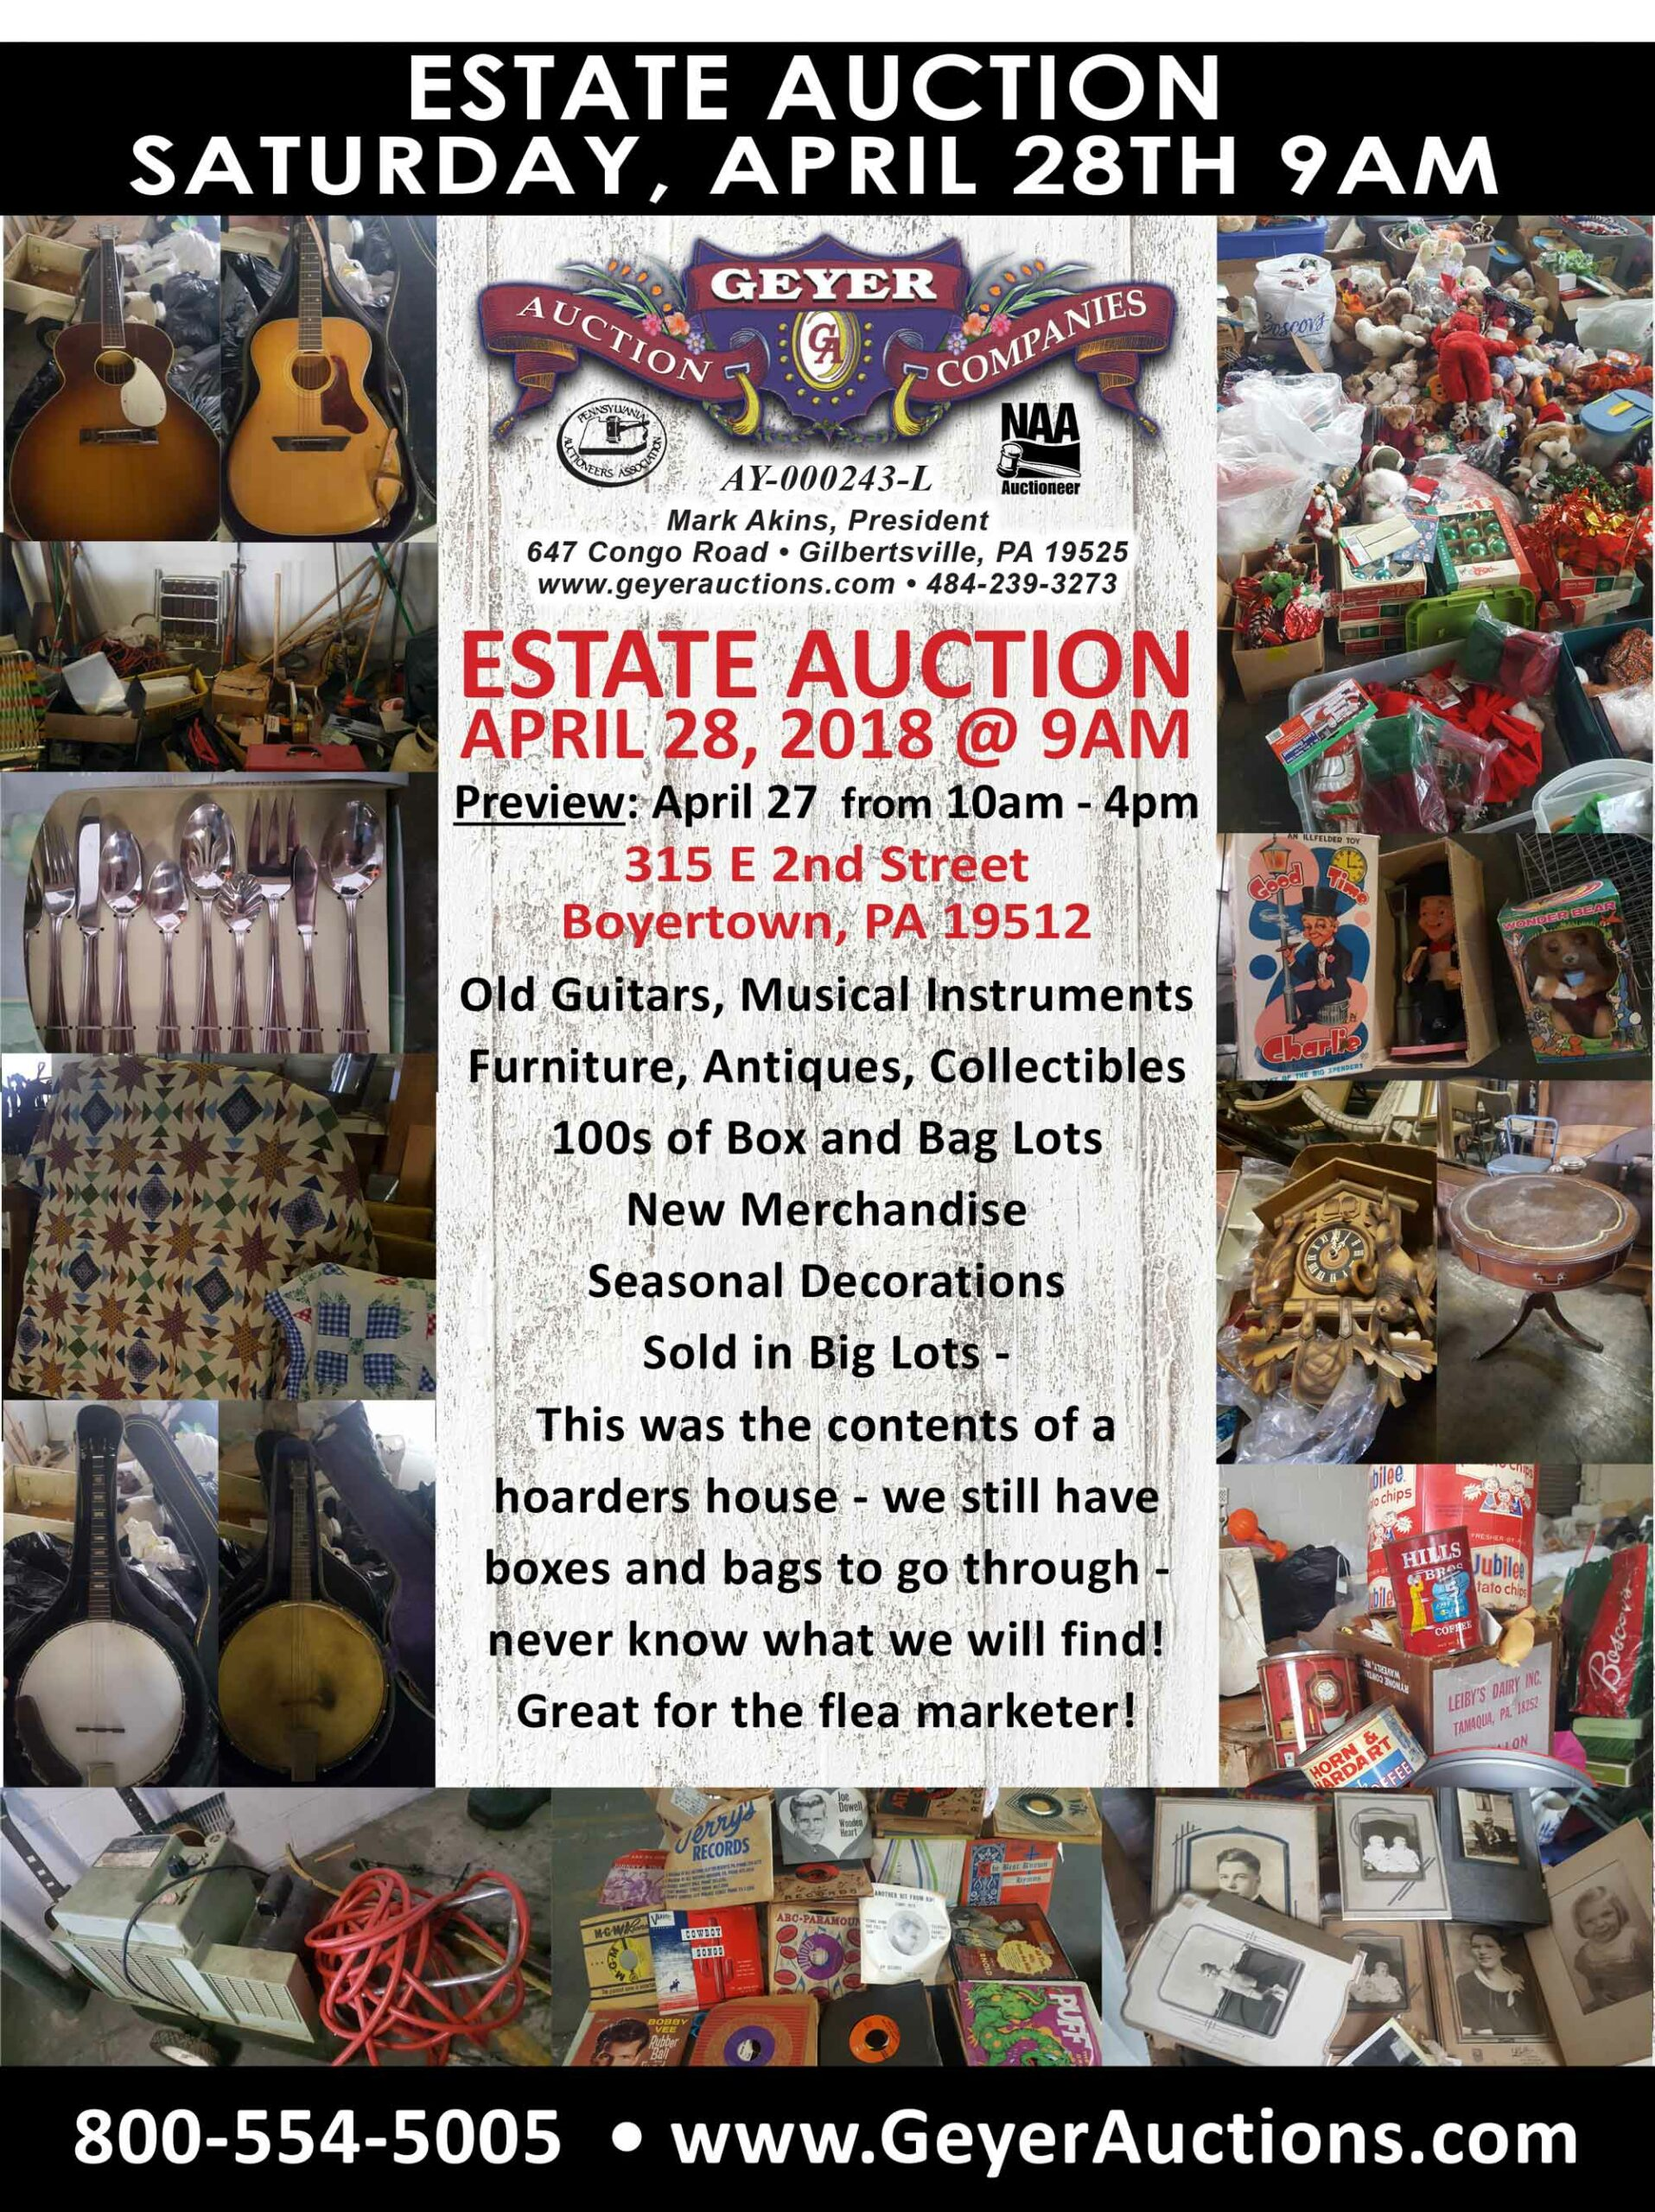 4_27_2019_BTown-Estate-Auction